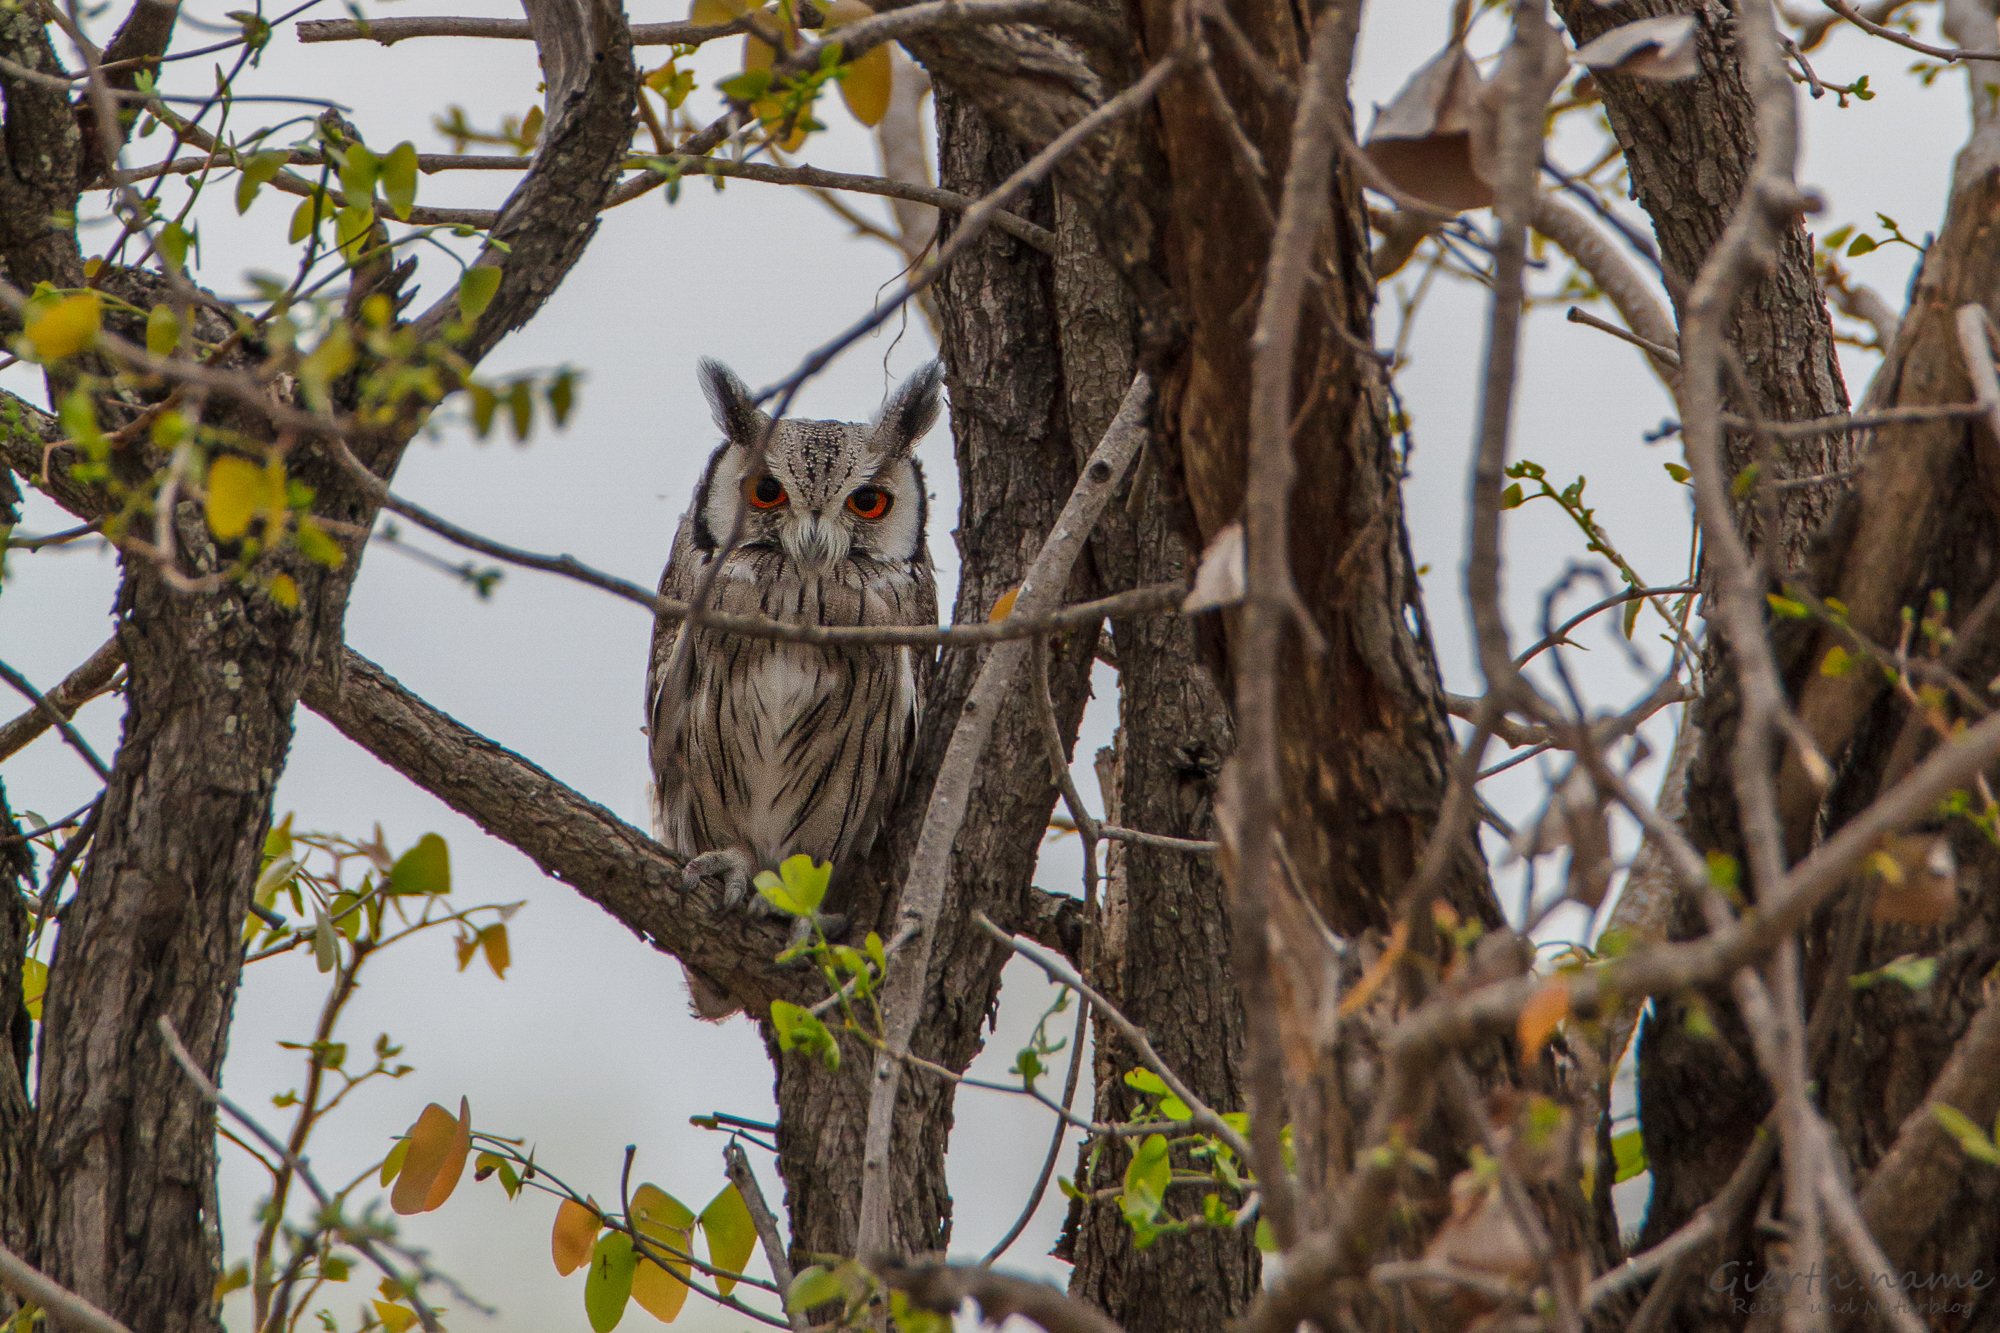 Südbüscheleule - Southern White-faced Owl - Ptilopsis granti